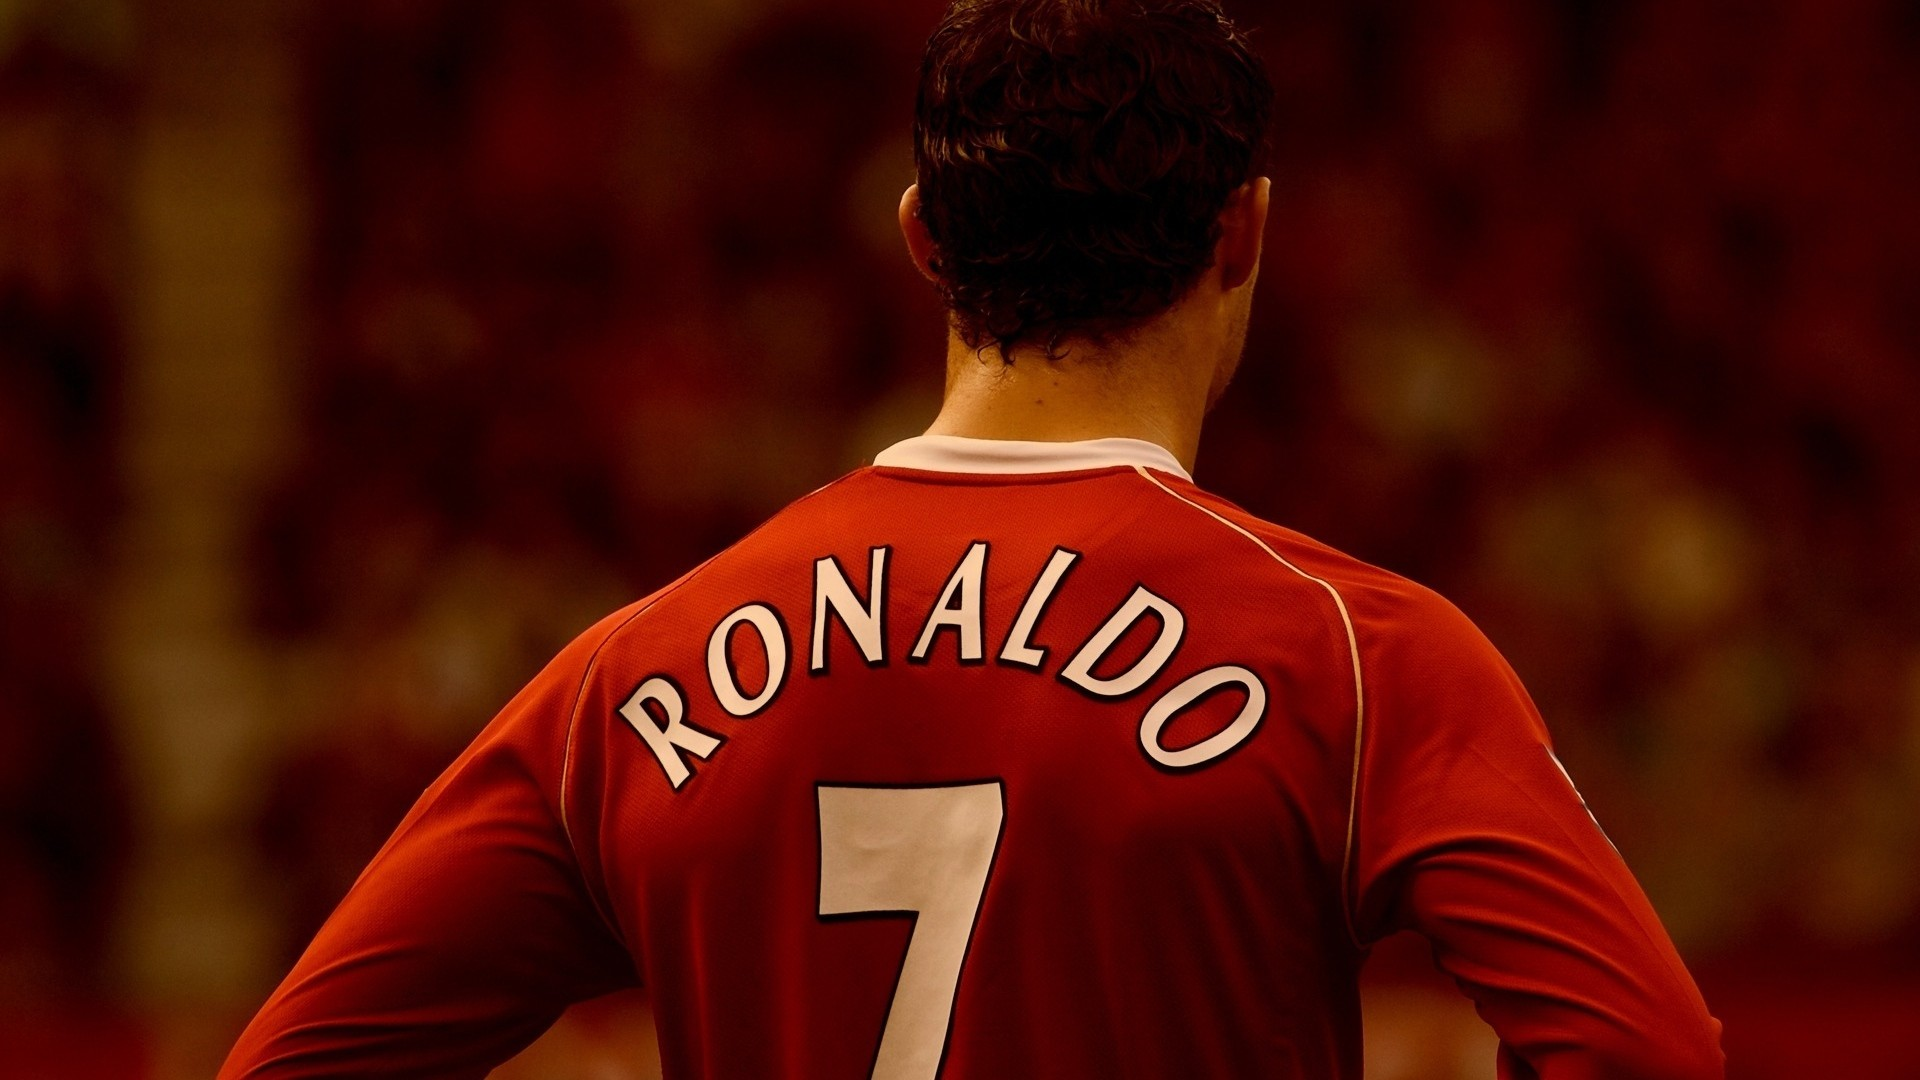 Wallpaper ronaldo, back, form, football